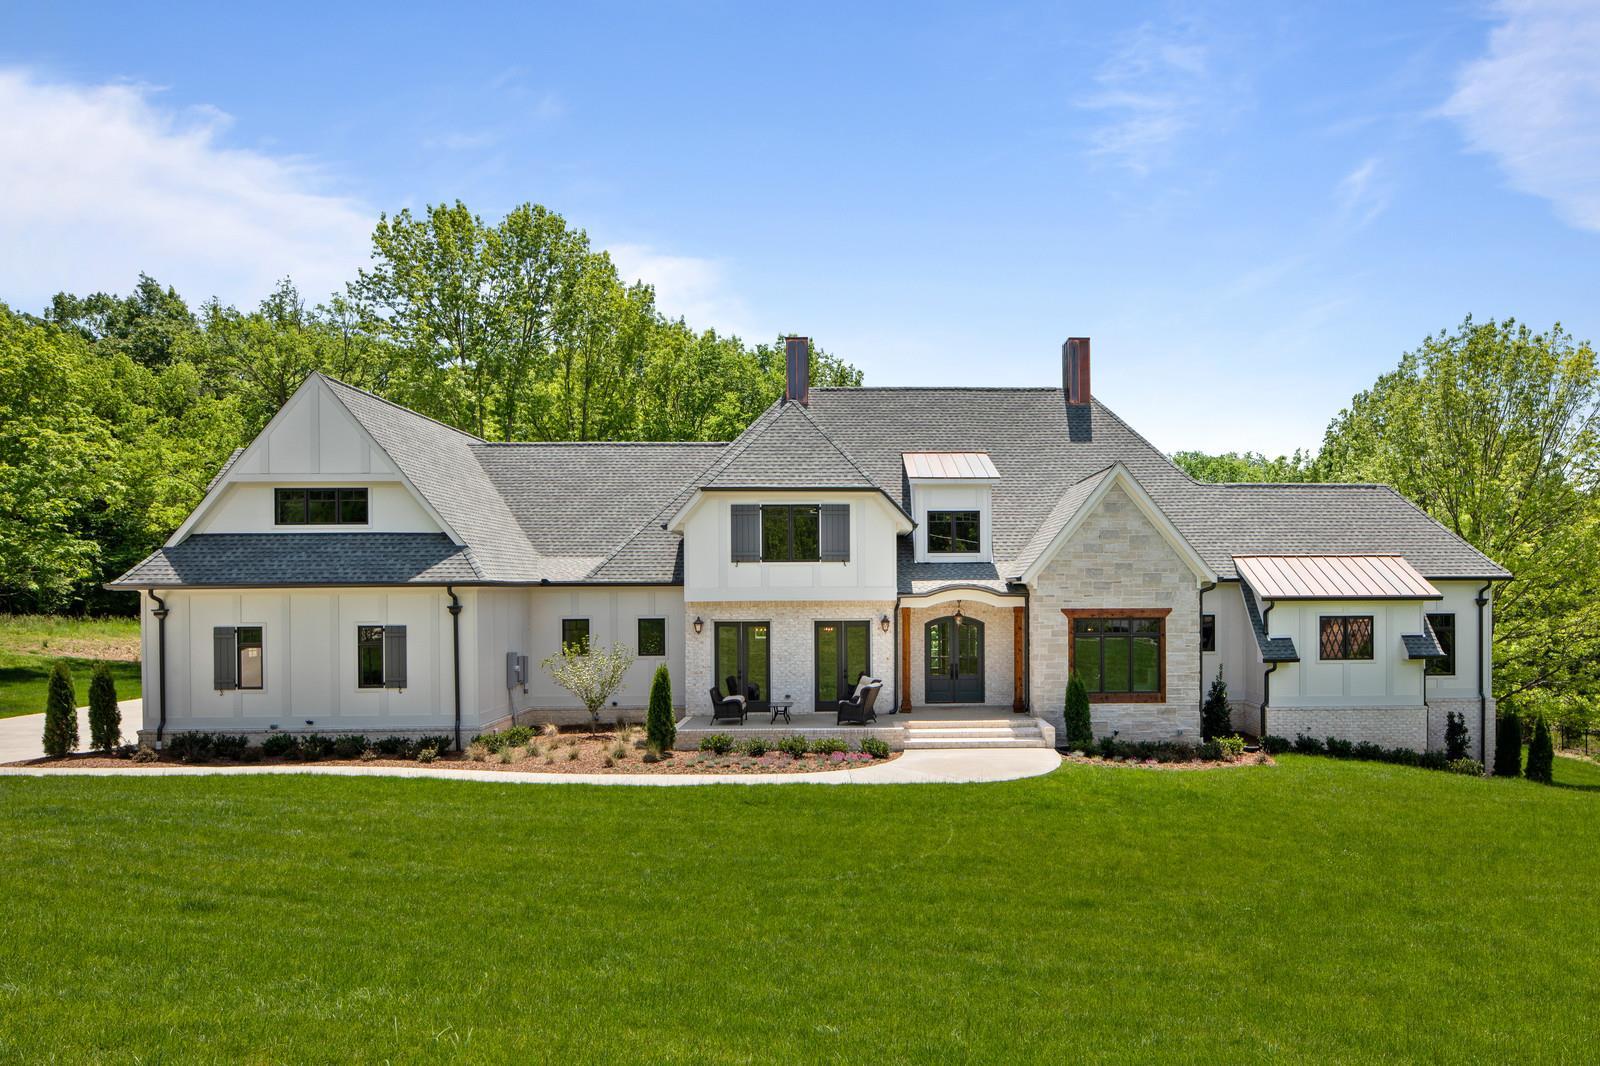 5256 Granny White Trace, Nashville, TN 37220 - Nashville, TN real estate listing